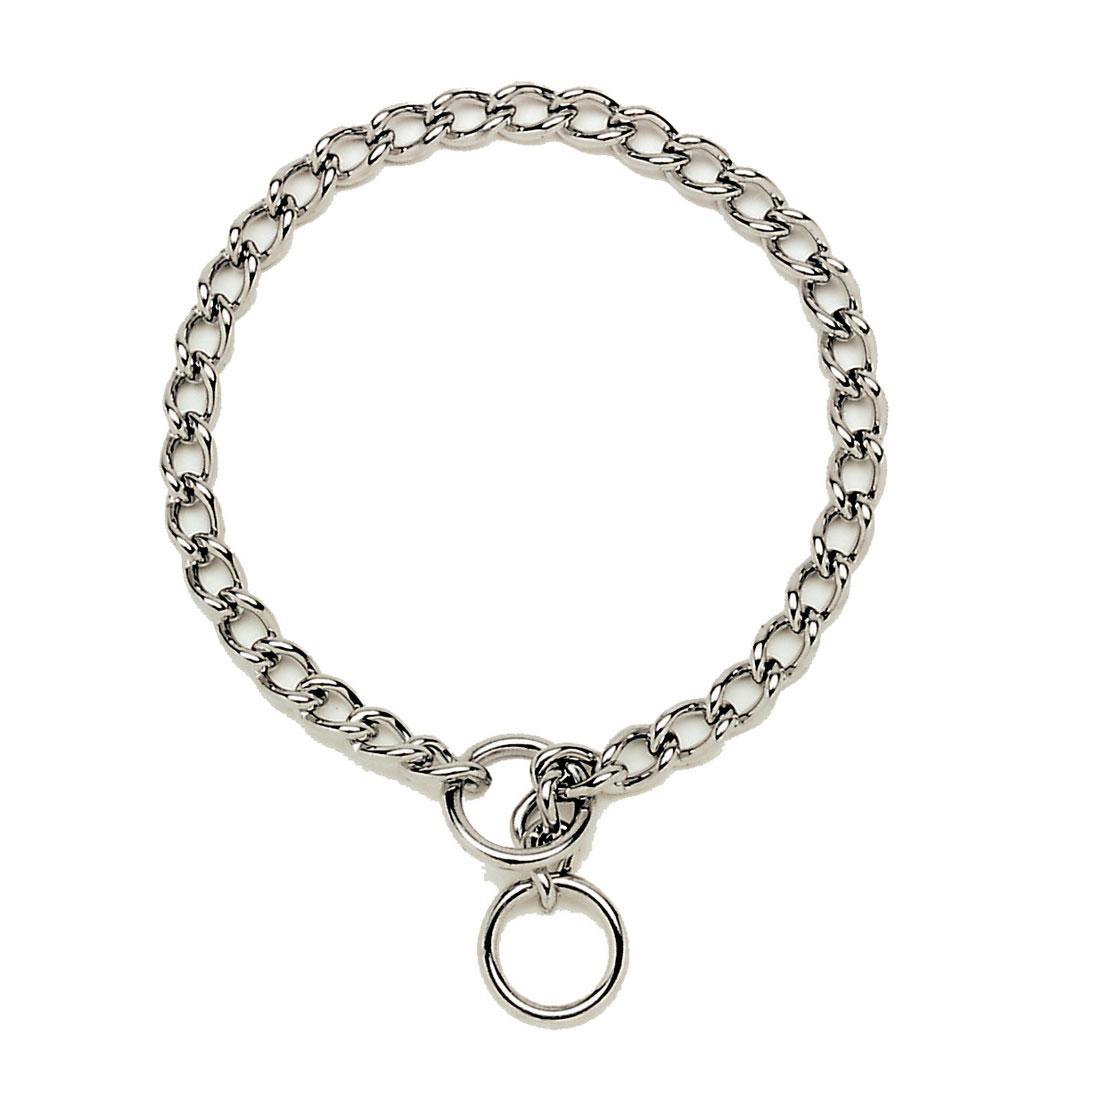 Coastal Titan Chain Training Dog Collar, 3-mm, 20-in